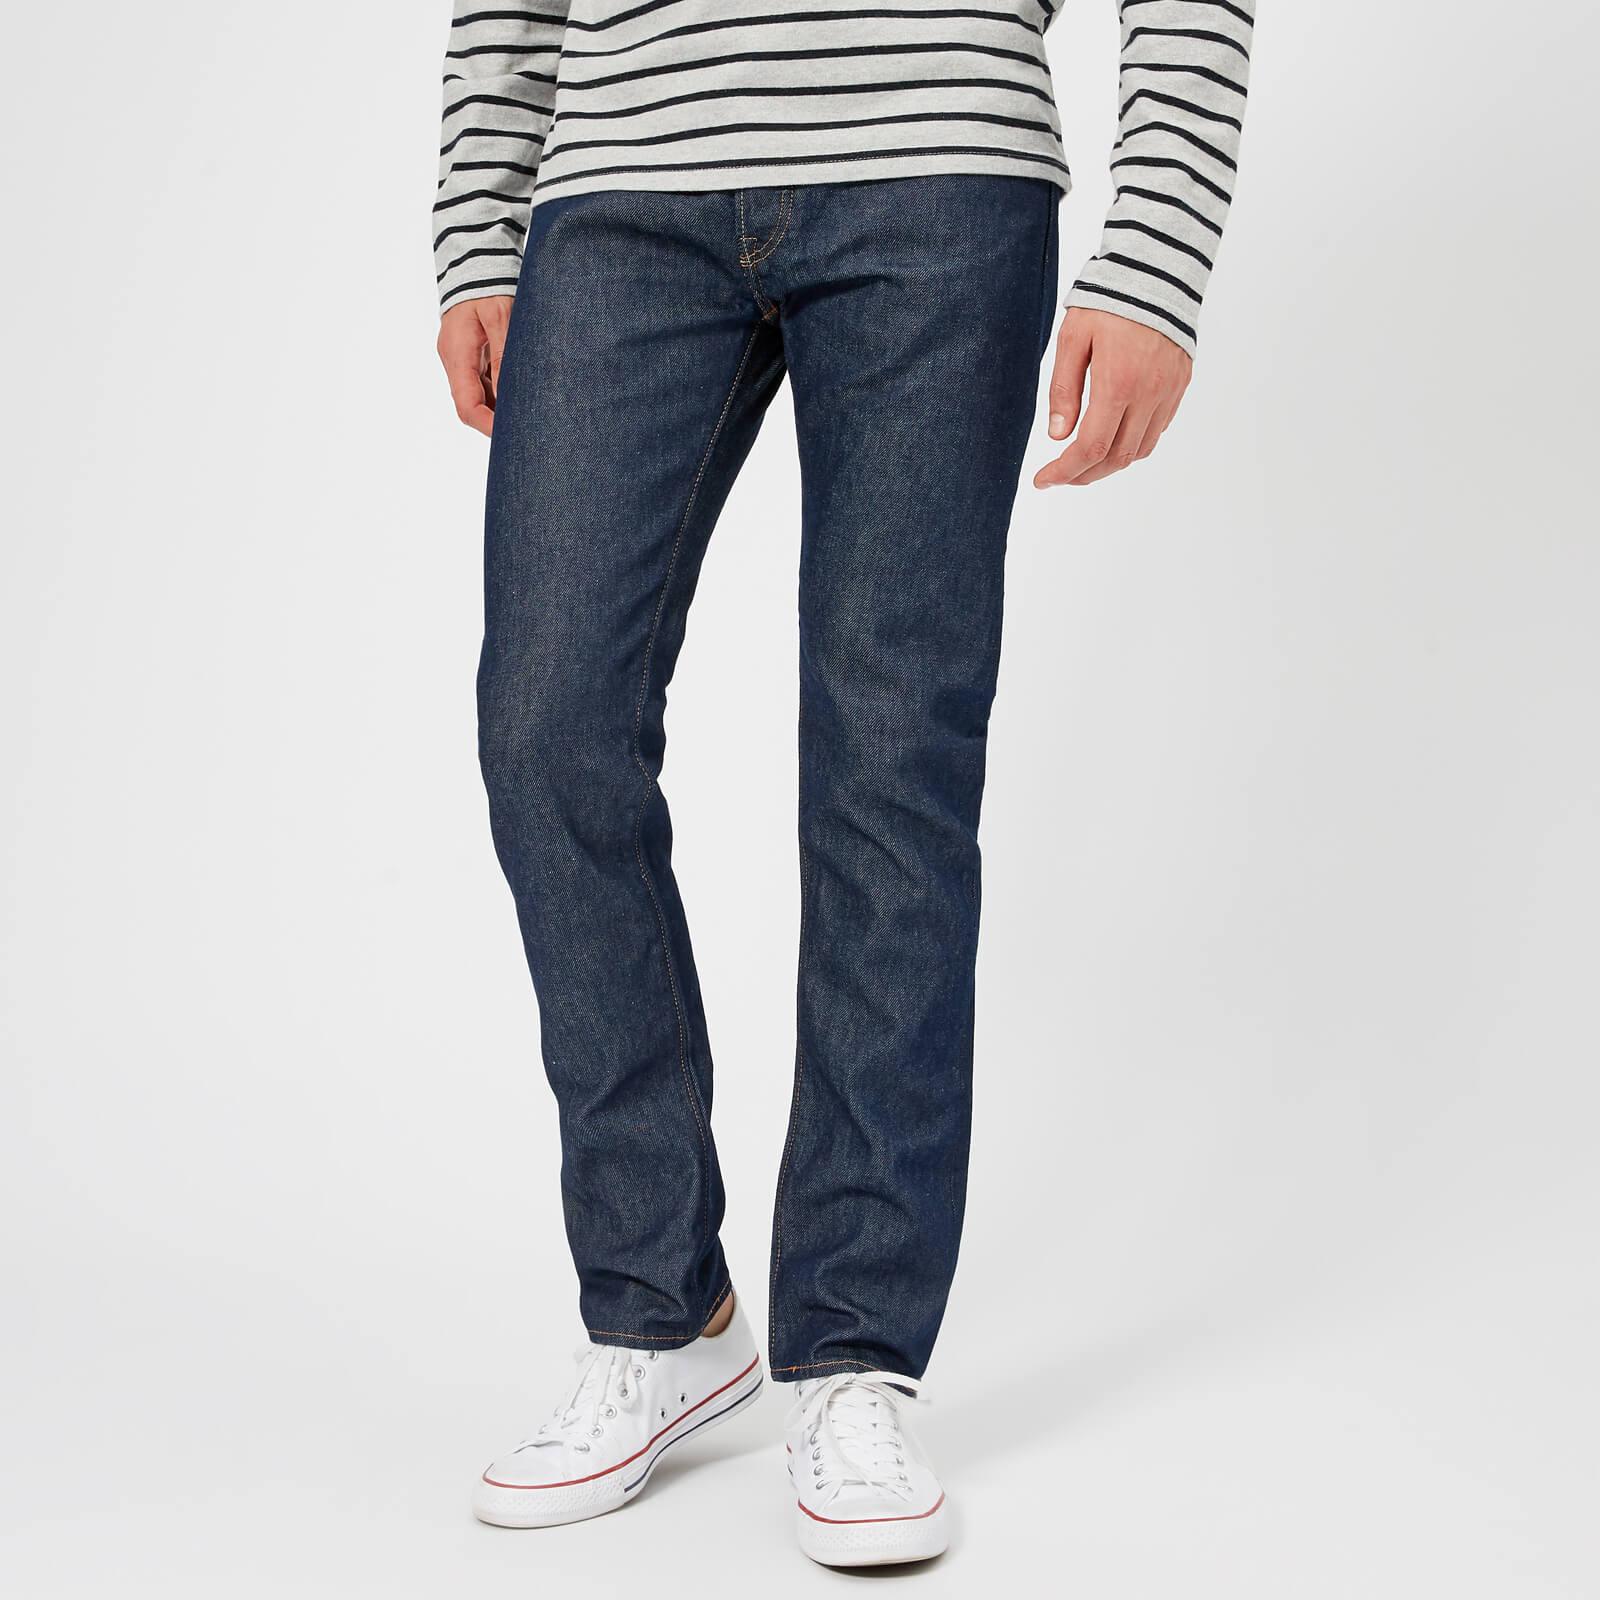 cc189309241 Levi's Men's 501 Skinny Jeans - Clint Warp Mens Clothing   TheHut.com